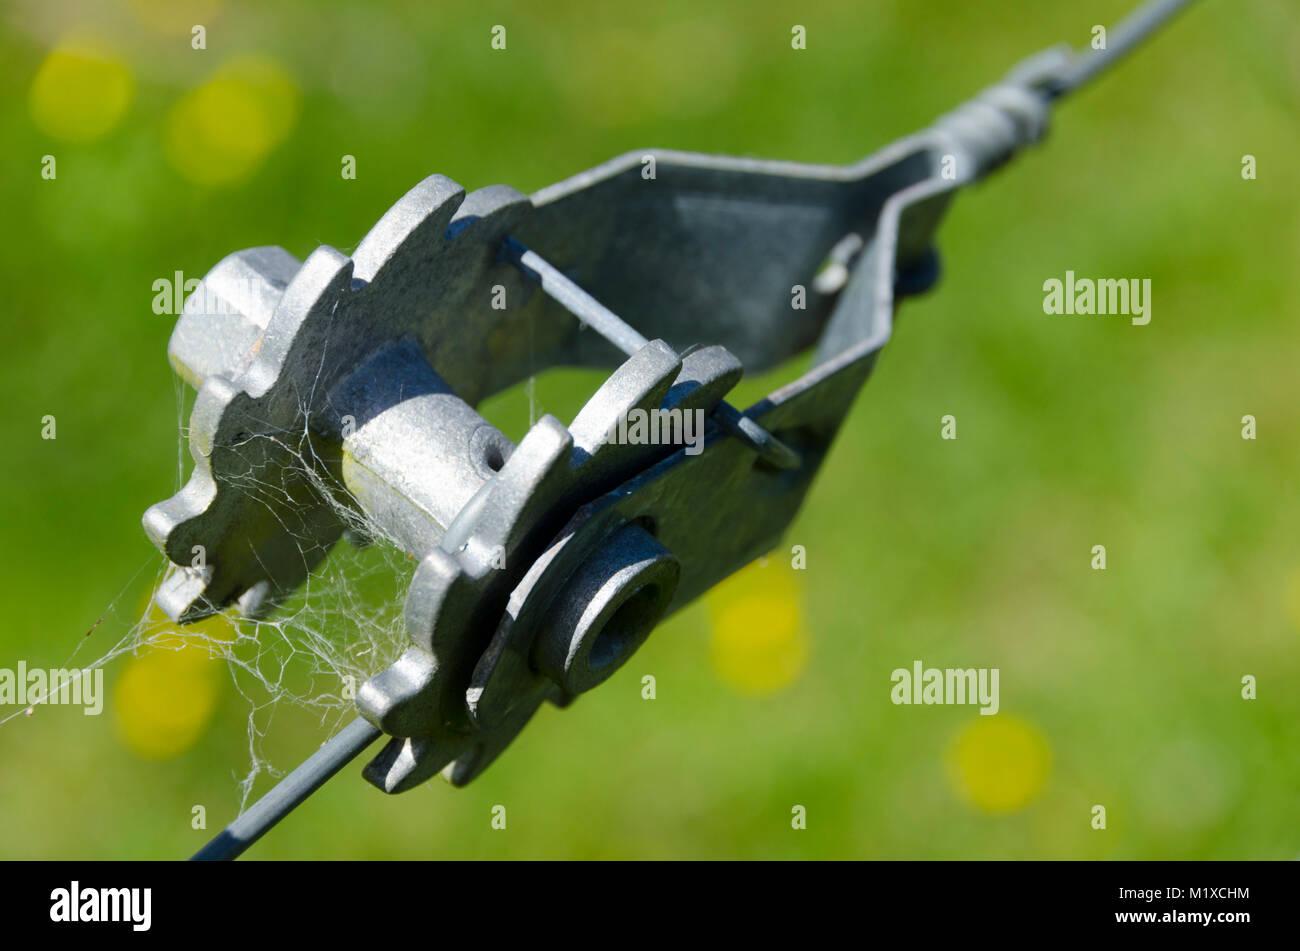 Bauernhof Zaun Draht Spanner Stockfoto Bild 173298992 Alamy